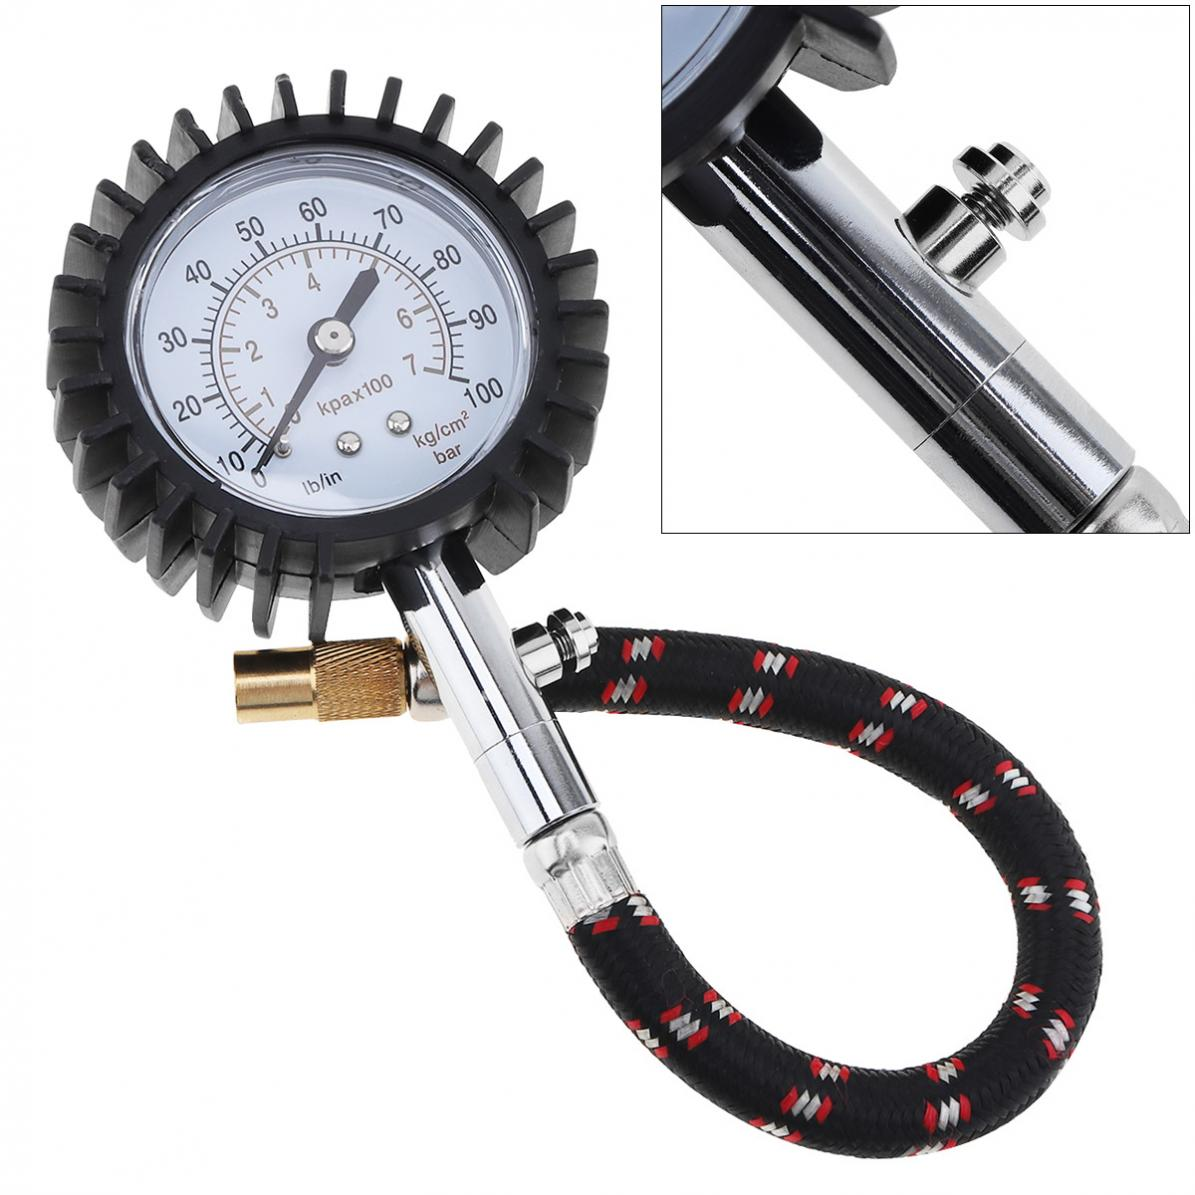 UNIT YD-6026 0-100 PSI Tyre Tire Air Pressure Dial Gauge Meter for Car Vehicle Motorcycle Tire Tool Accurate measurement